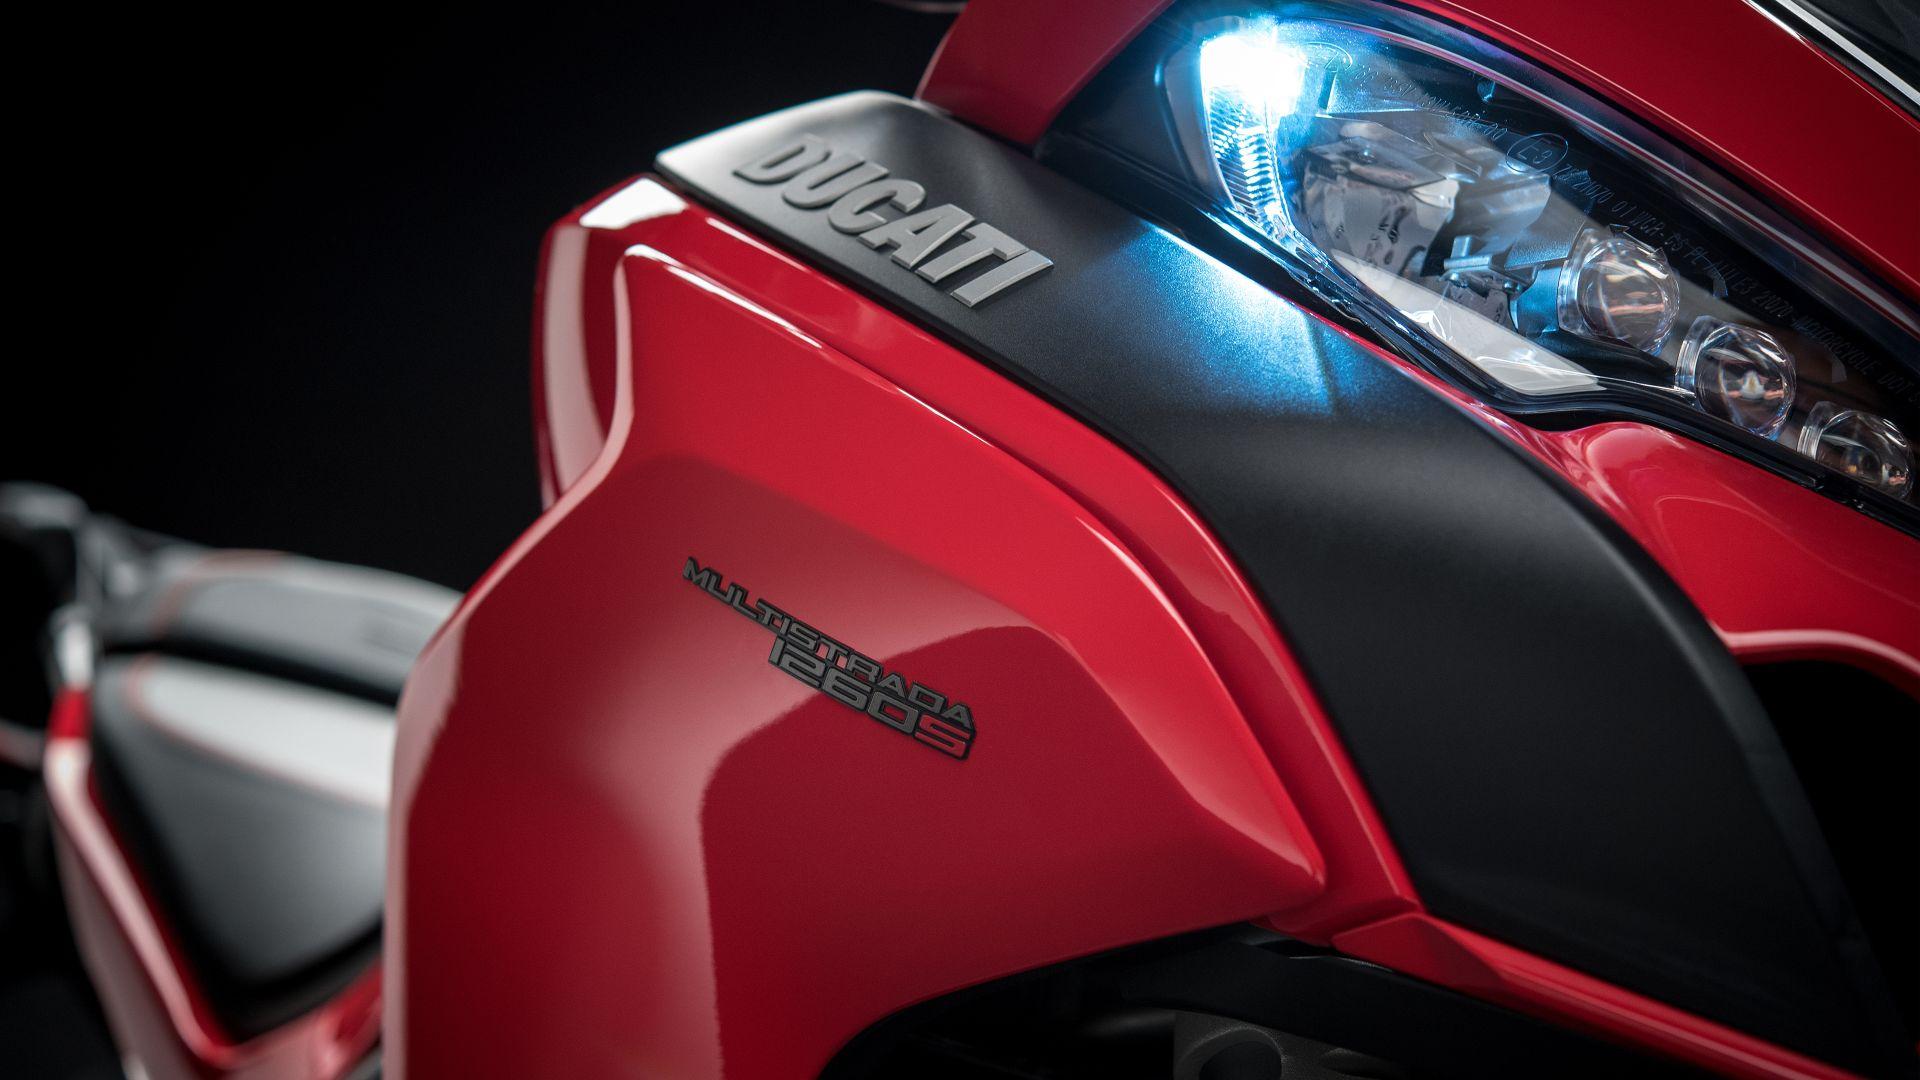 Wallpaper 2018 Ducati Multistrada 1260, headlight, 4k